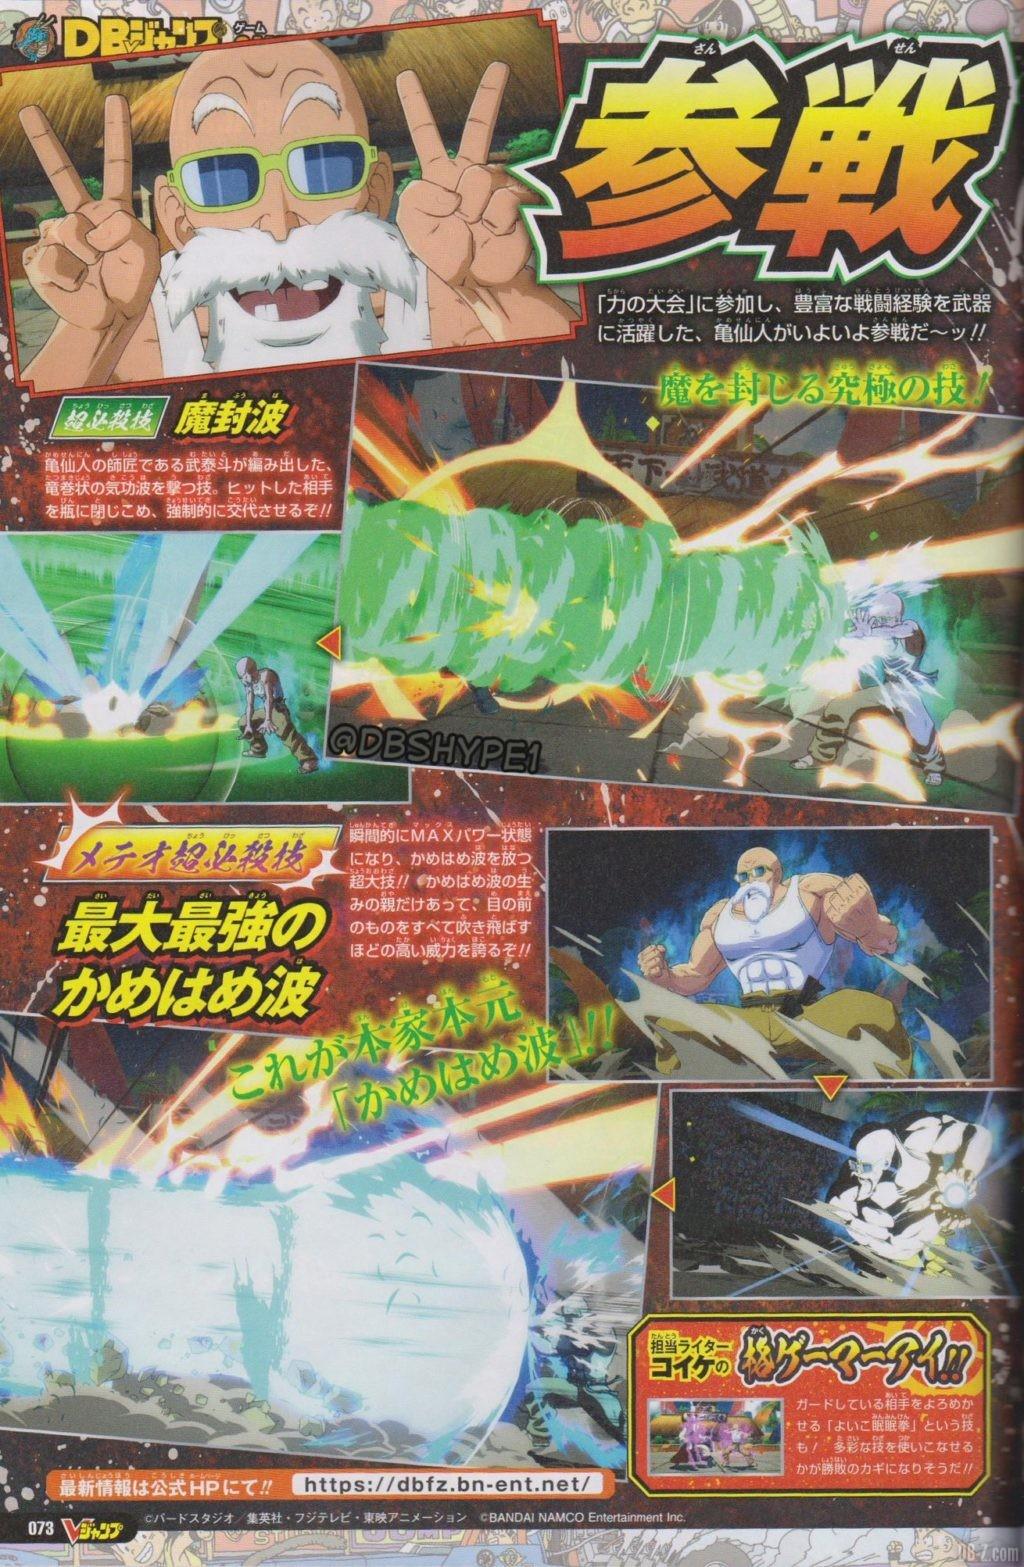 Dragon Ball FighterZ Kame Sennin Muten Roshi V Jump page 1